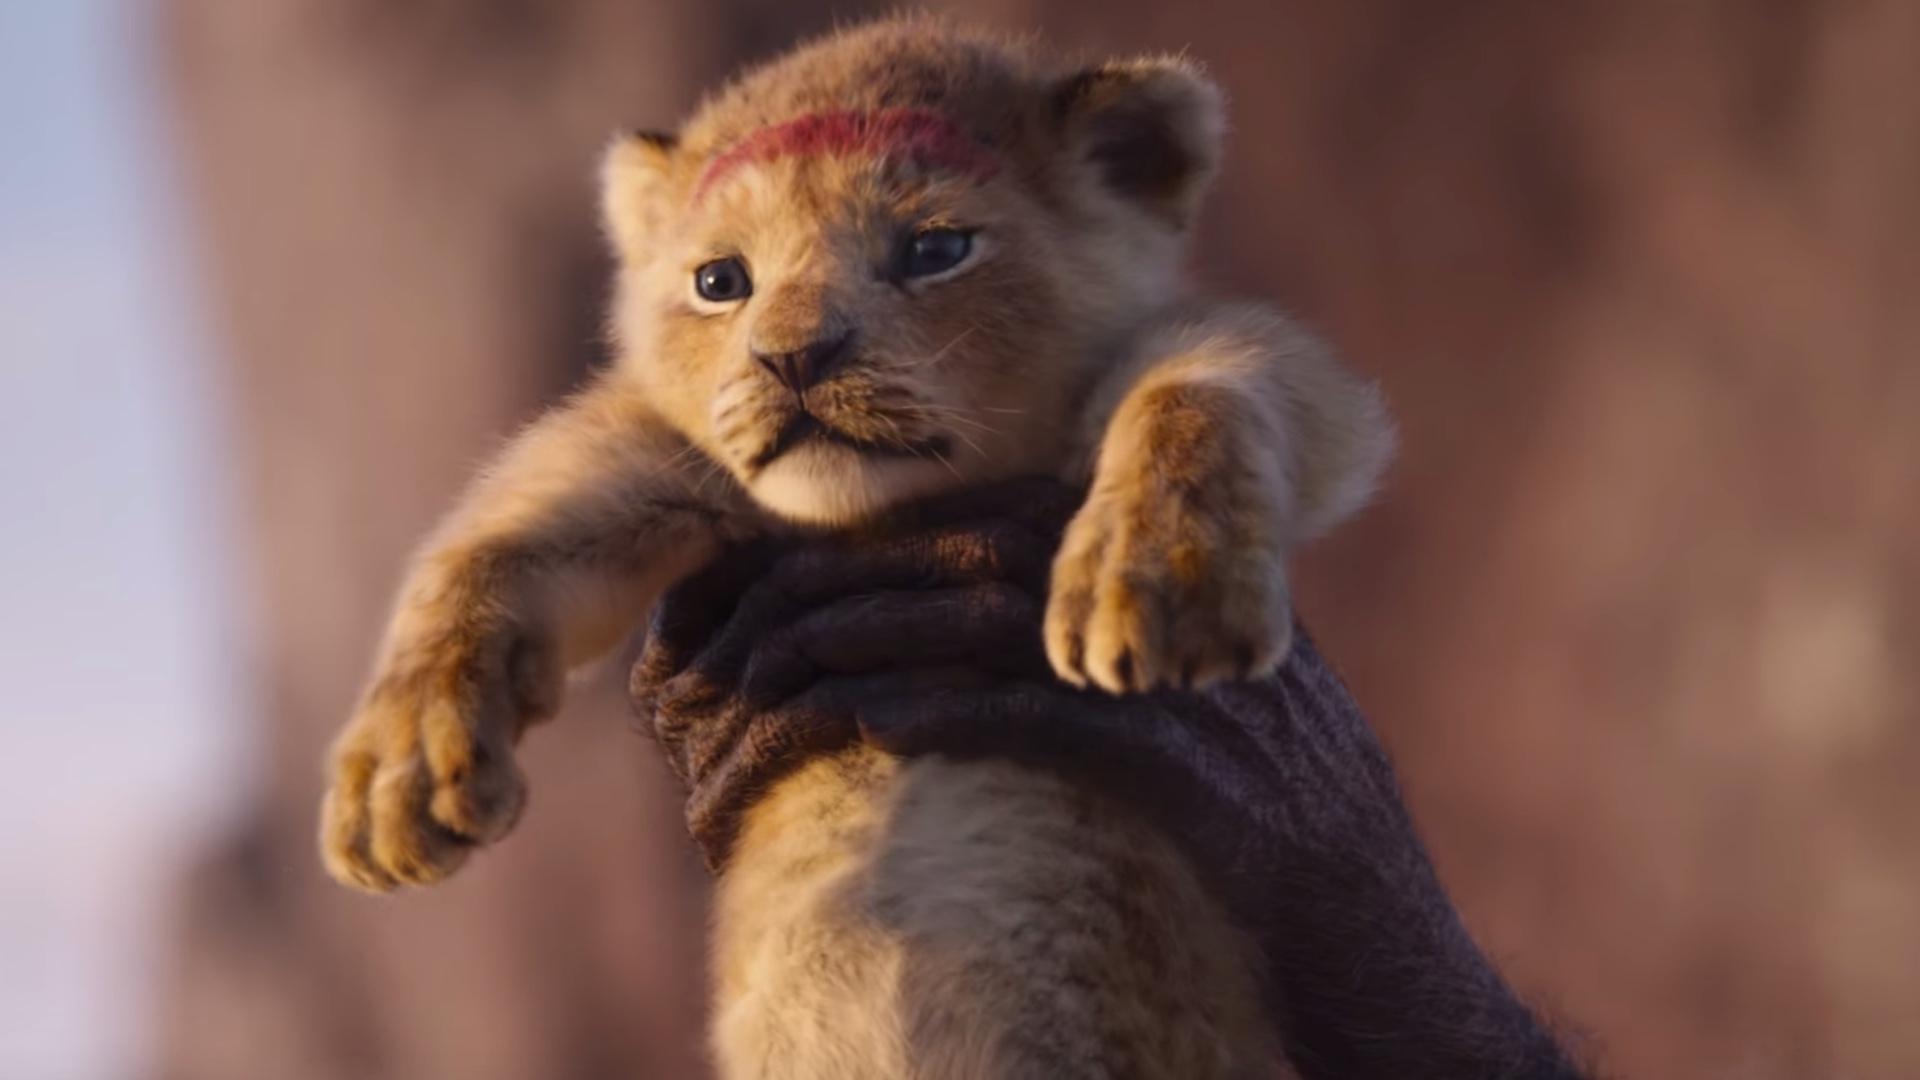 new-featurette-for-the-lion-king-the-king-returns-social.jpg